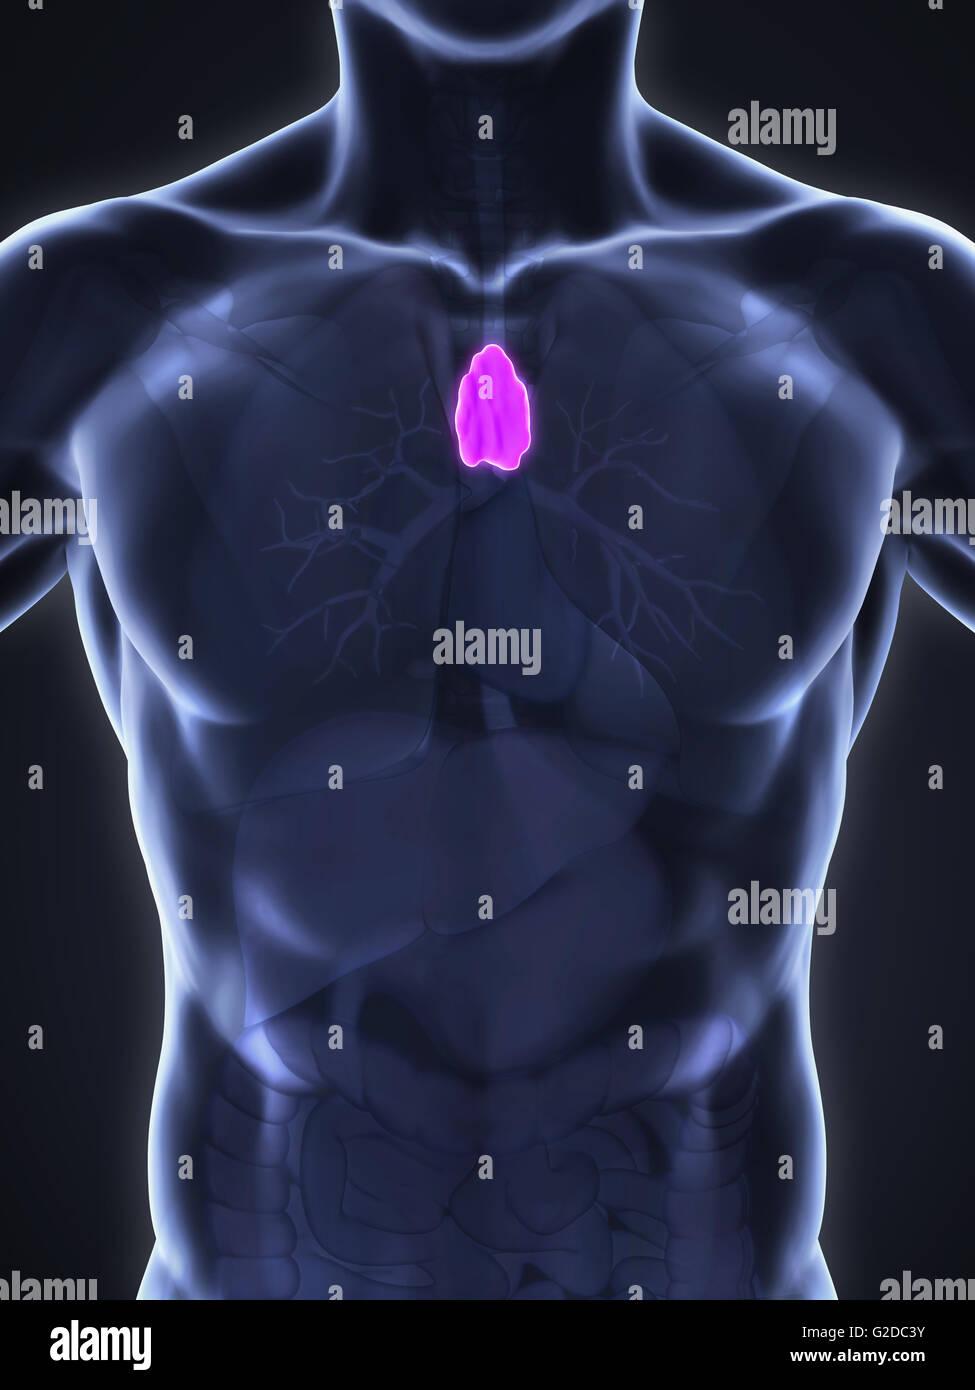 Human Thymus Anatomy Stock Photo: 104786415 - Alamy